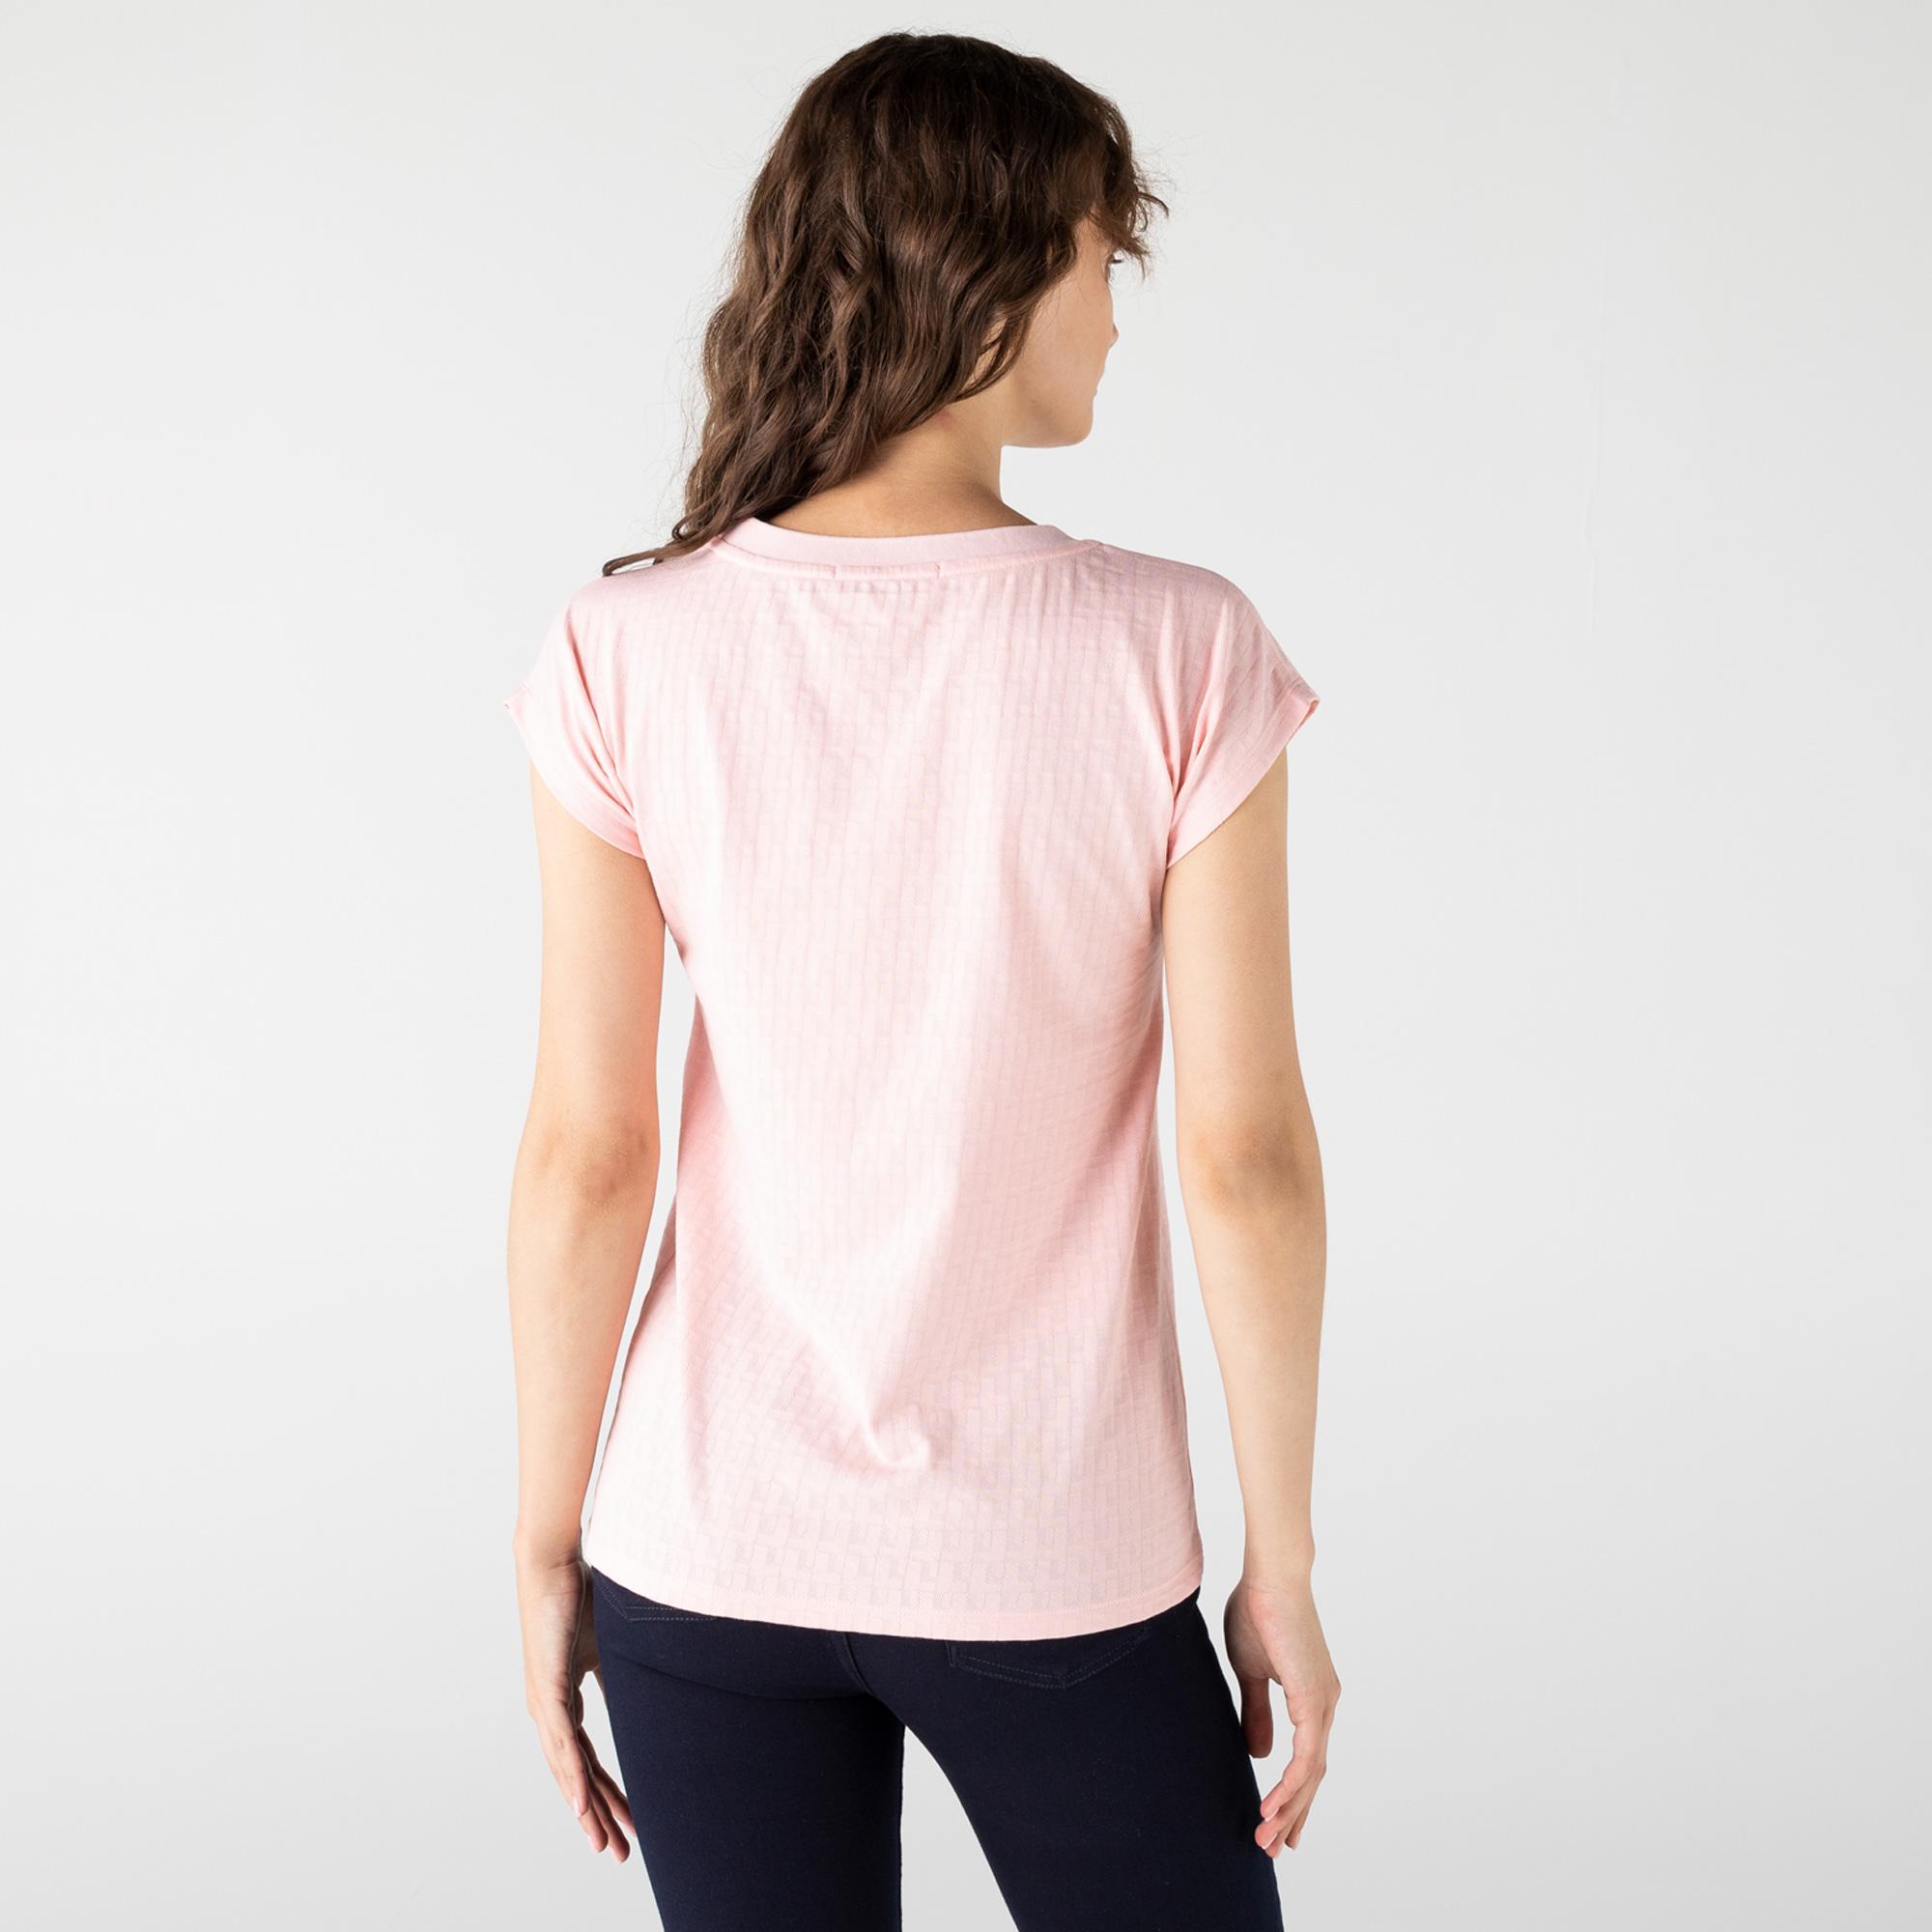 Lacoste Kadın Bisiklet Yaka Desenli Pembe T-Shirt